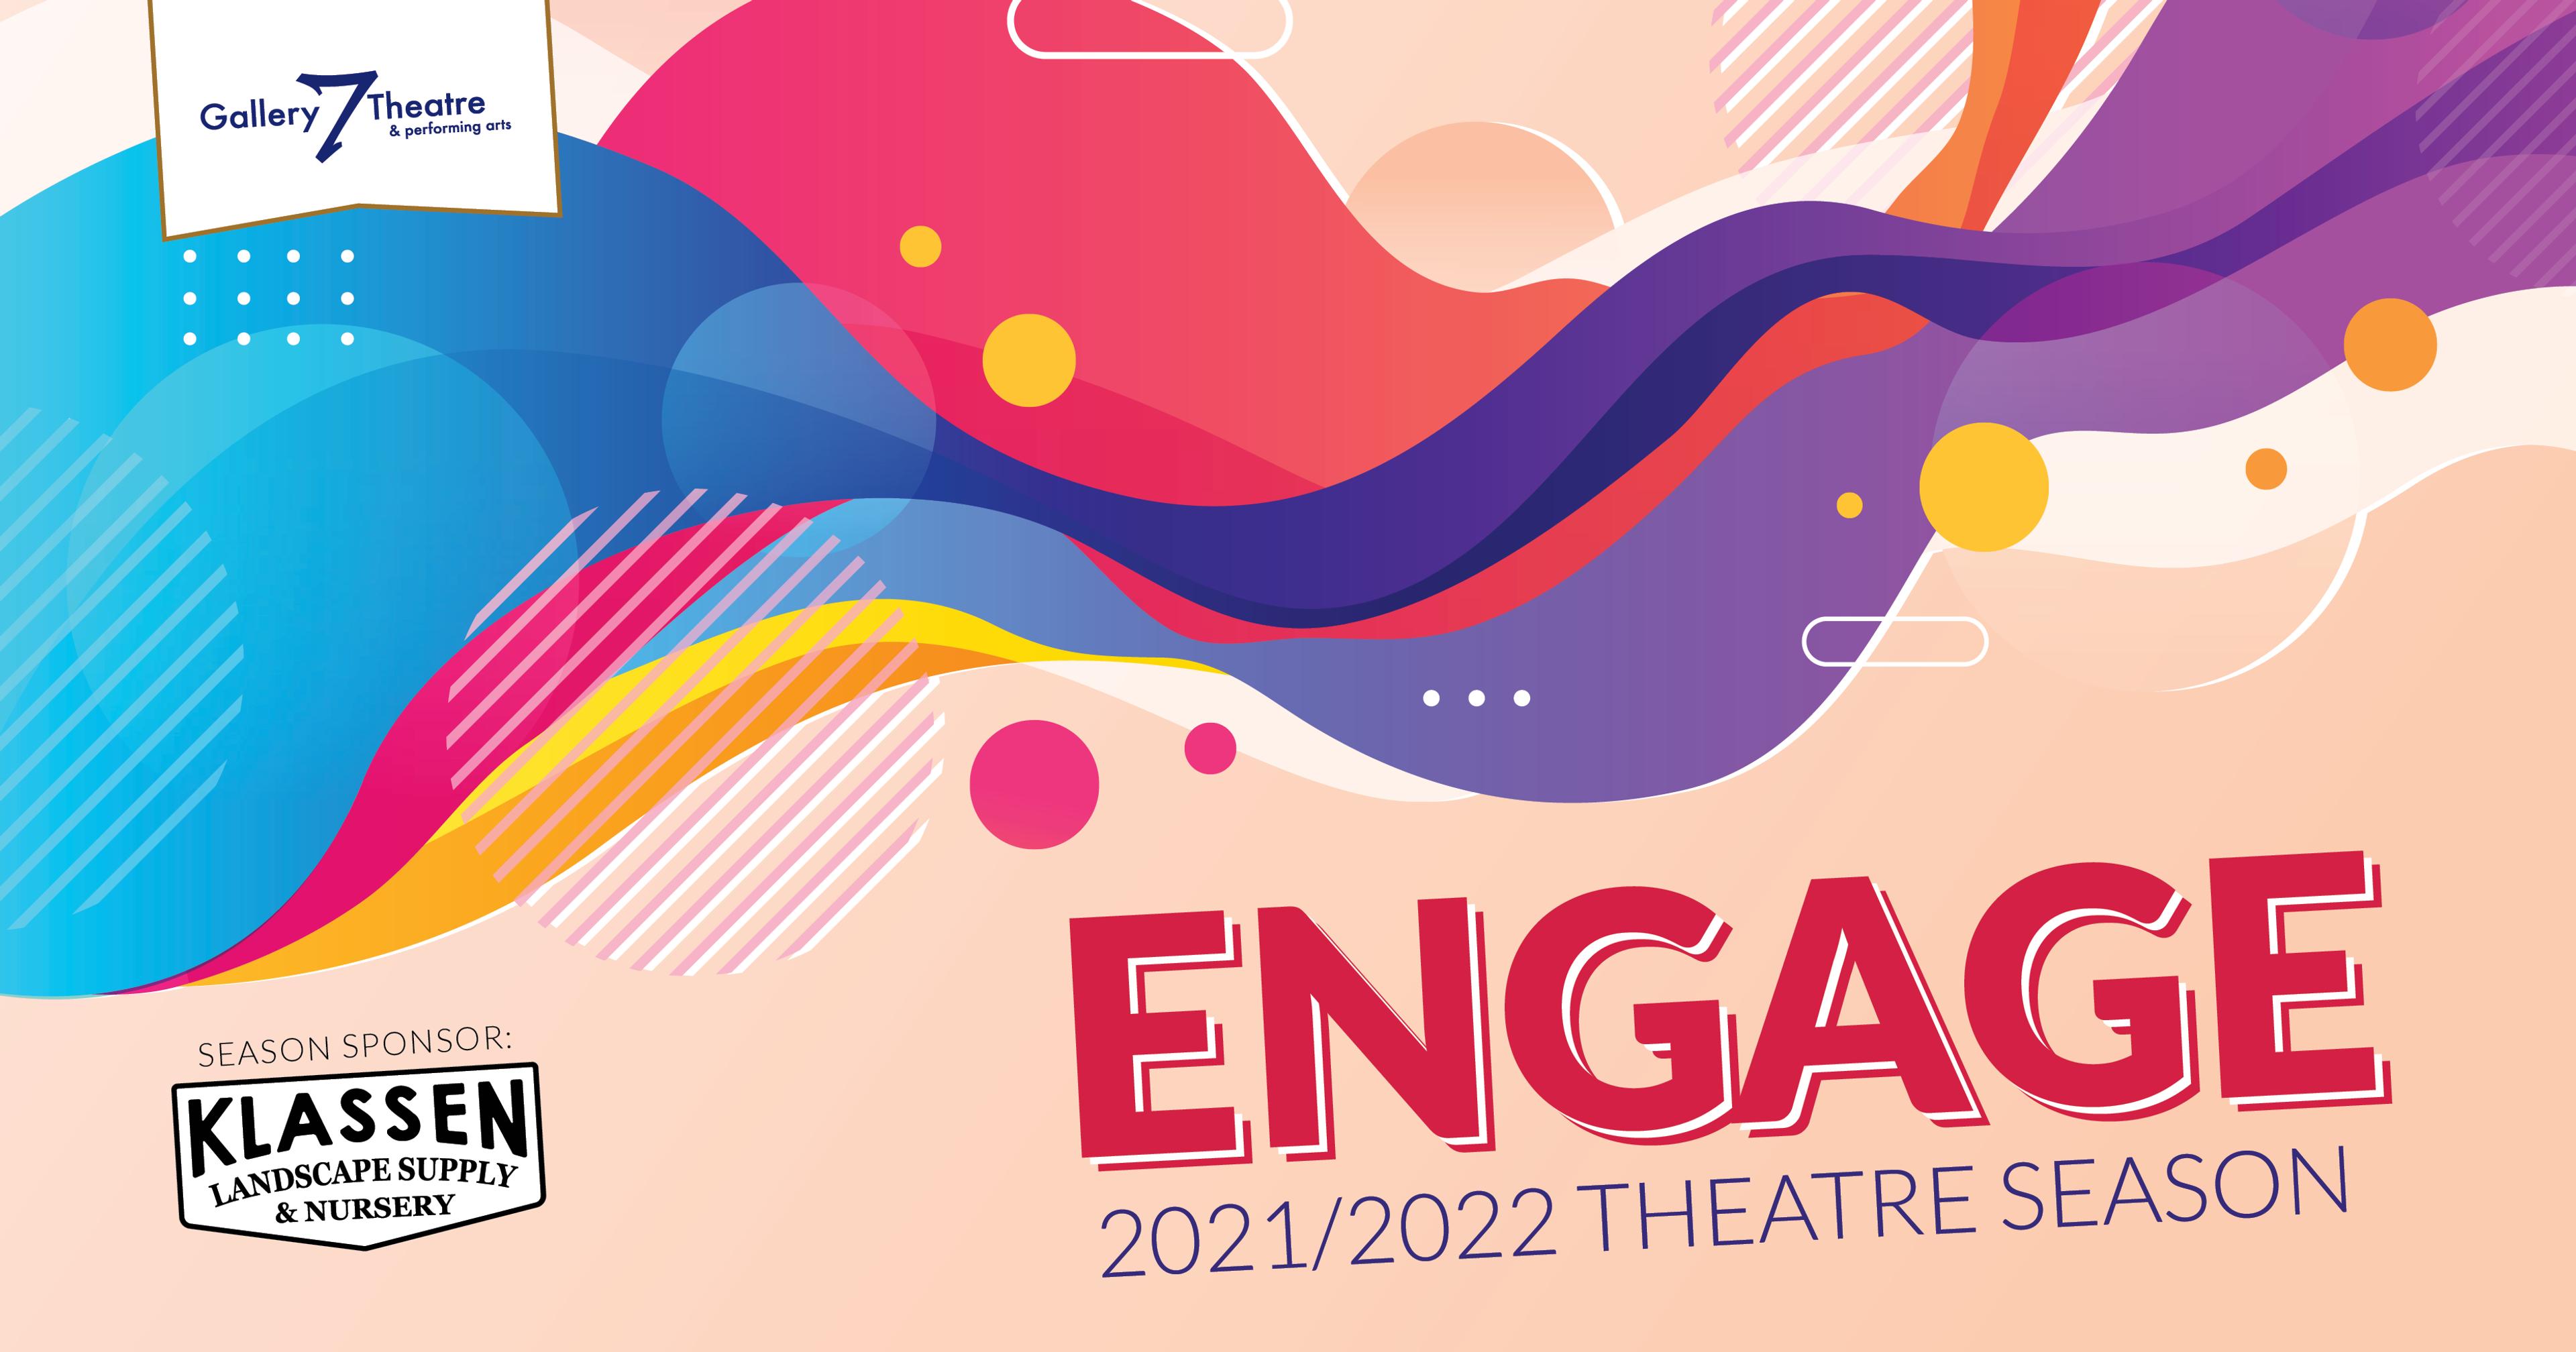 Engage 2021-2022 Theatre Season